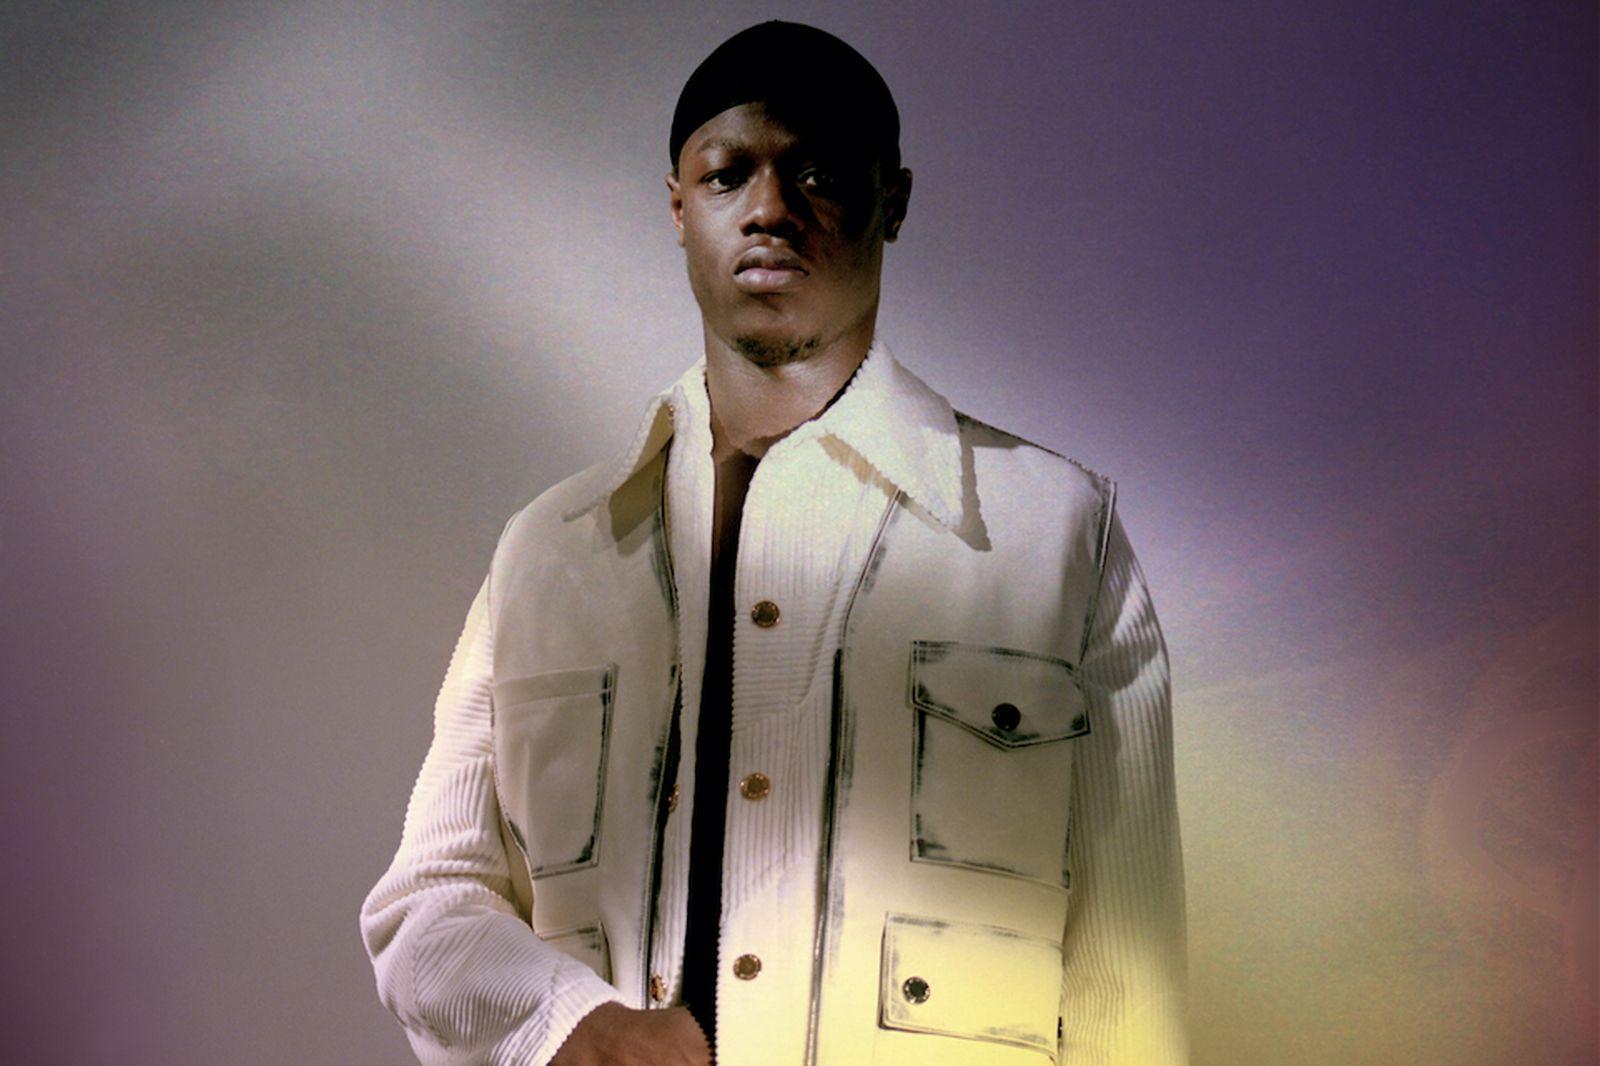 J Hus white jacket